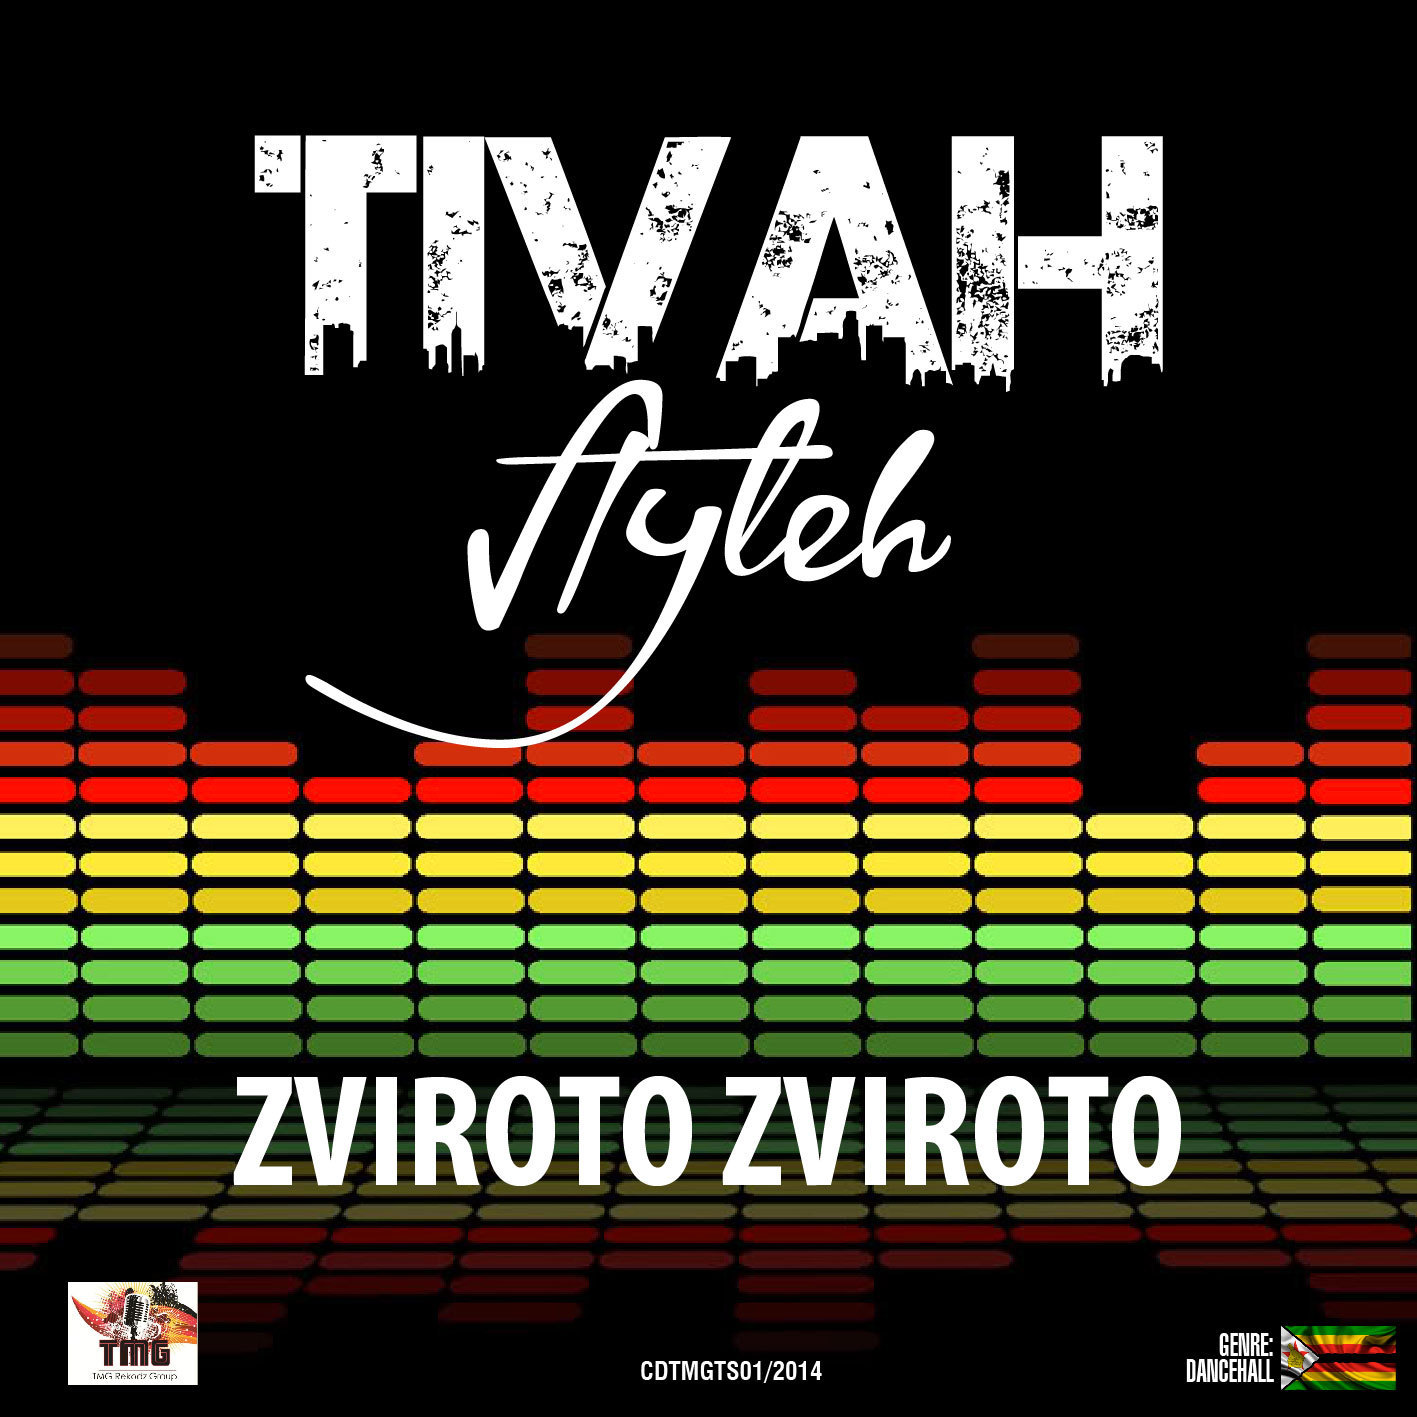 she luvs me djaa mr noxa ft trae yung by tmg rekodz zimbabwe